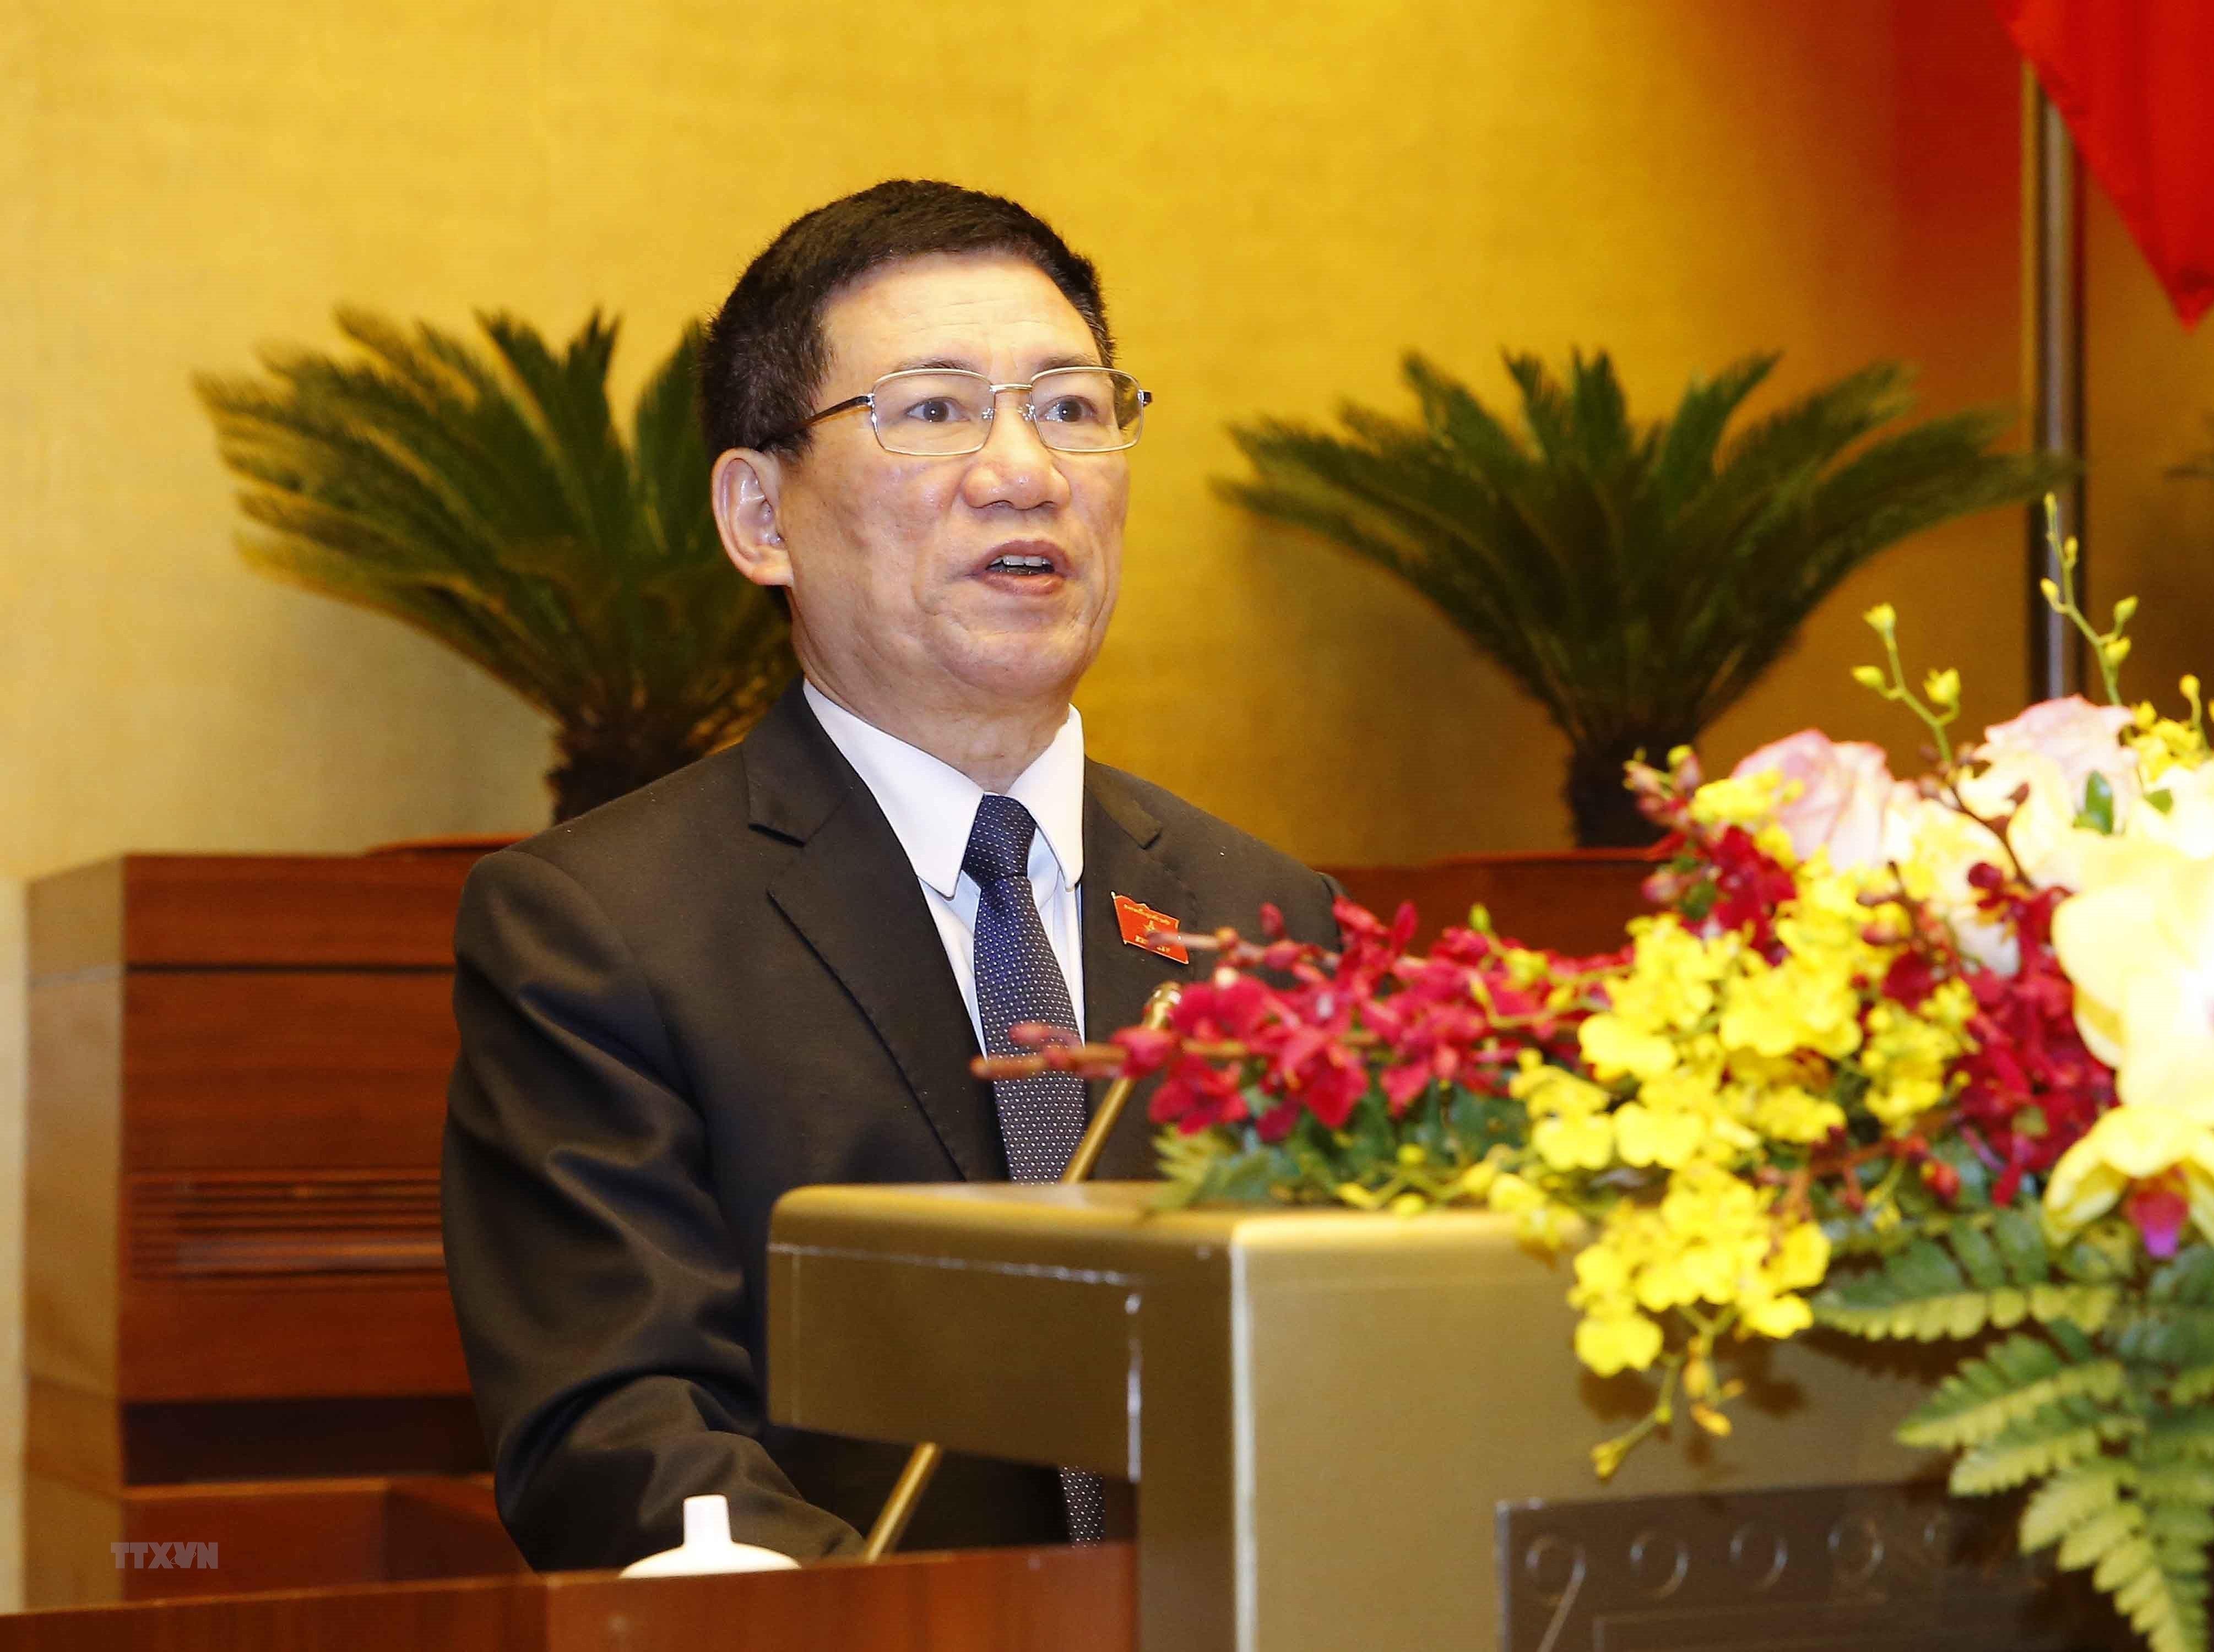 Bo truong Tai chinh Ho Duc Phoc: Su dung hieu qua nguon luc tai chinh hinh anh 1